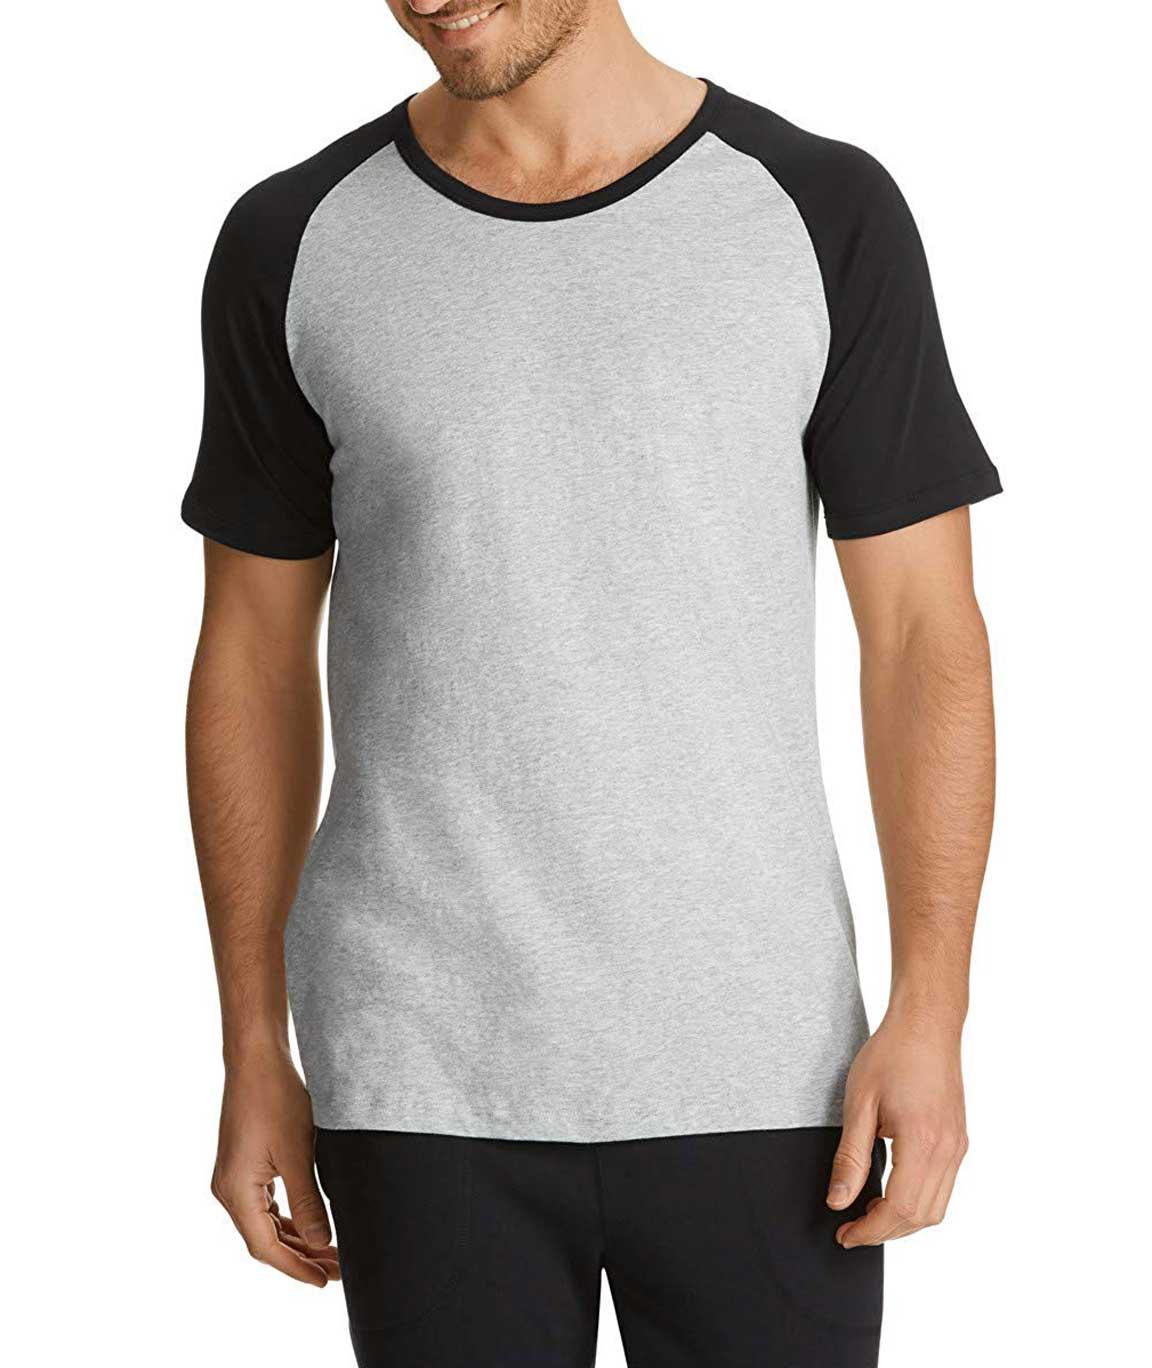 Vestiario Grey Round Neck T-Shirt